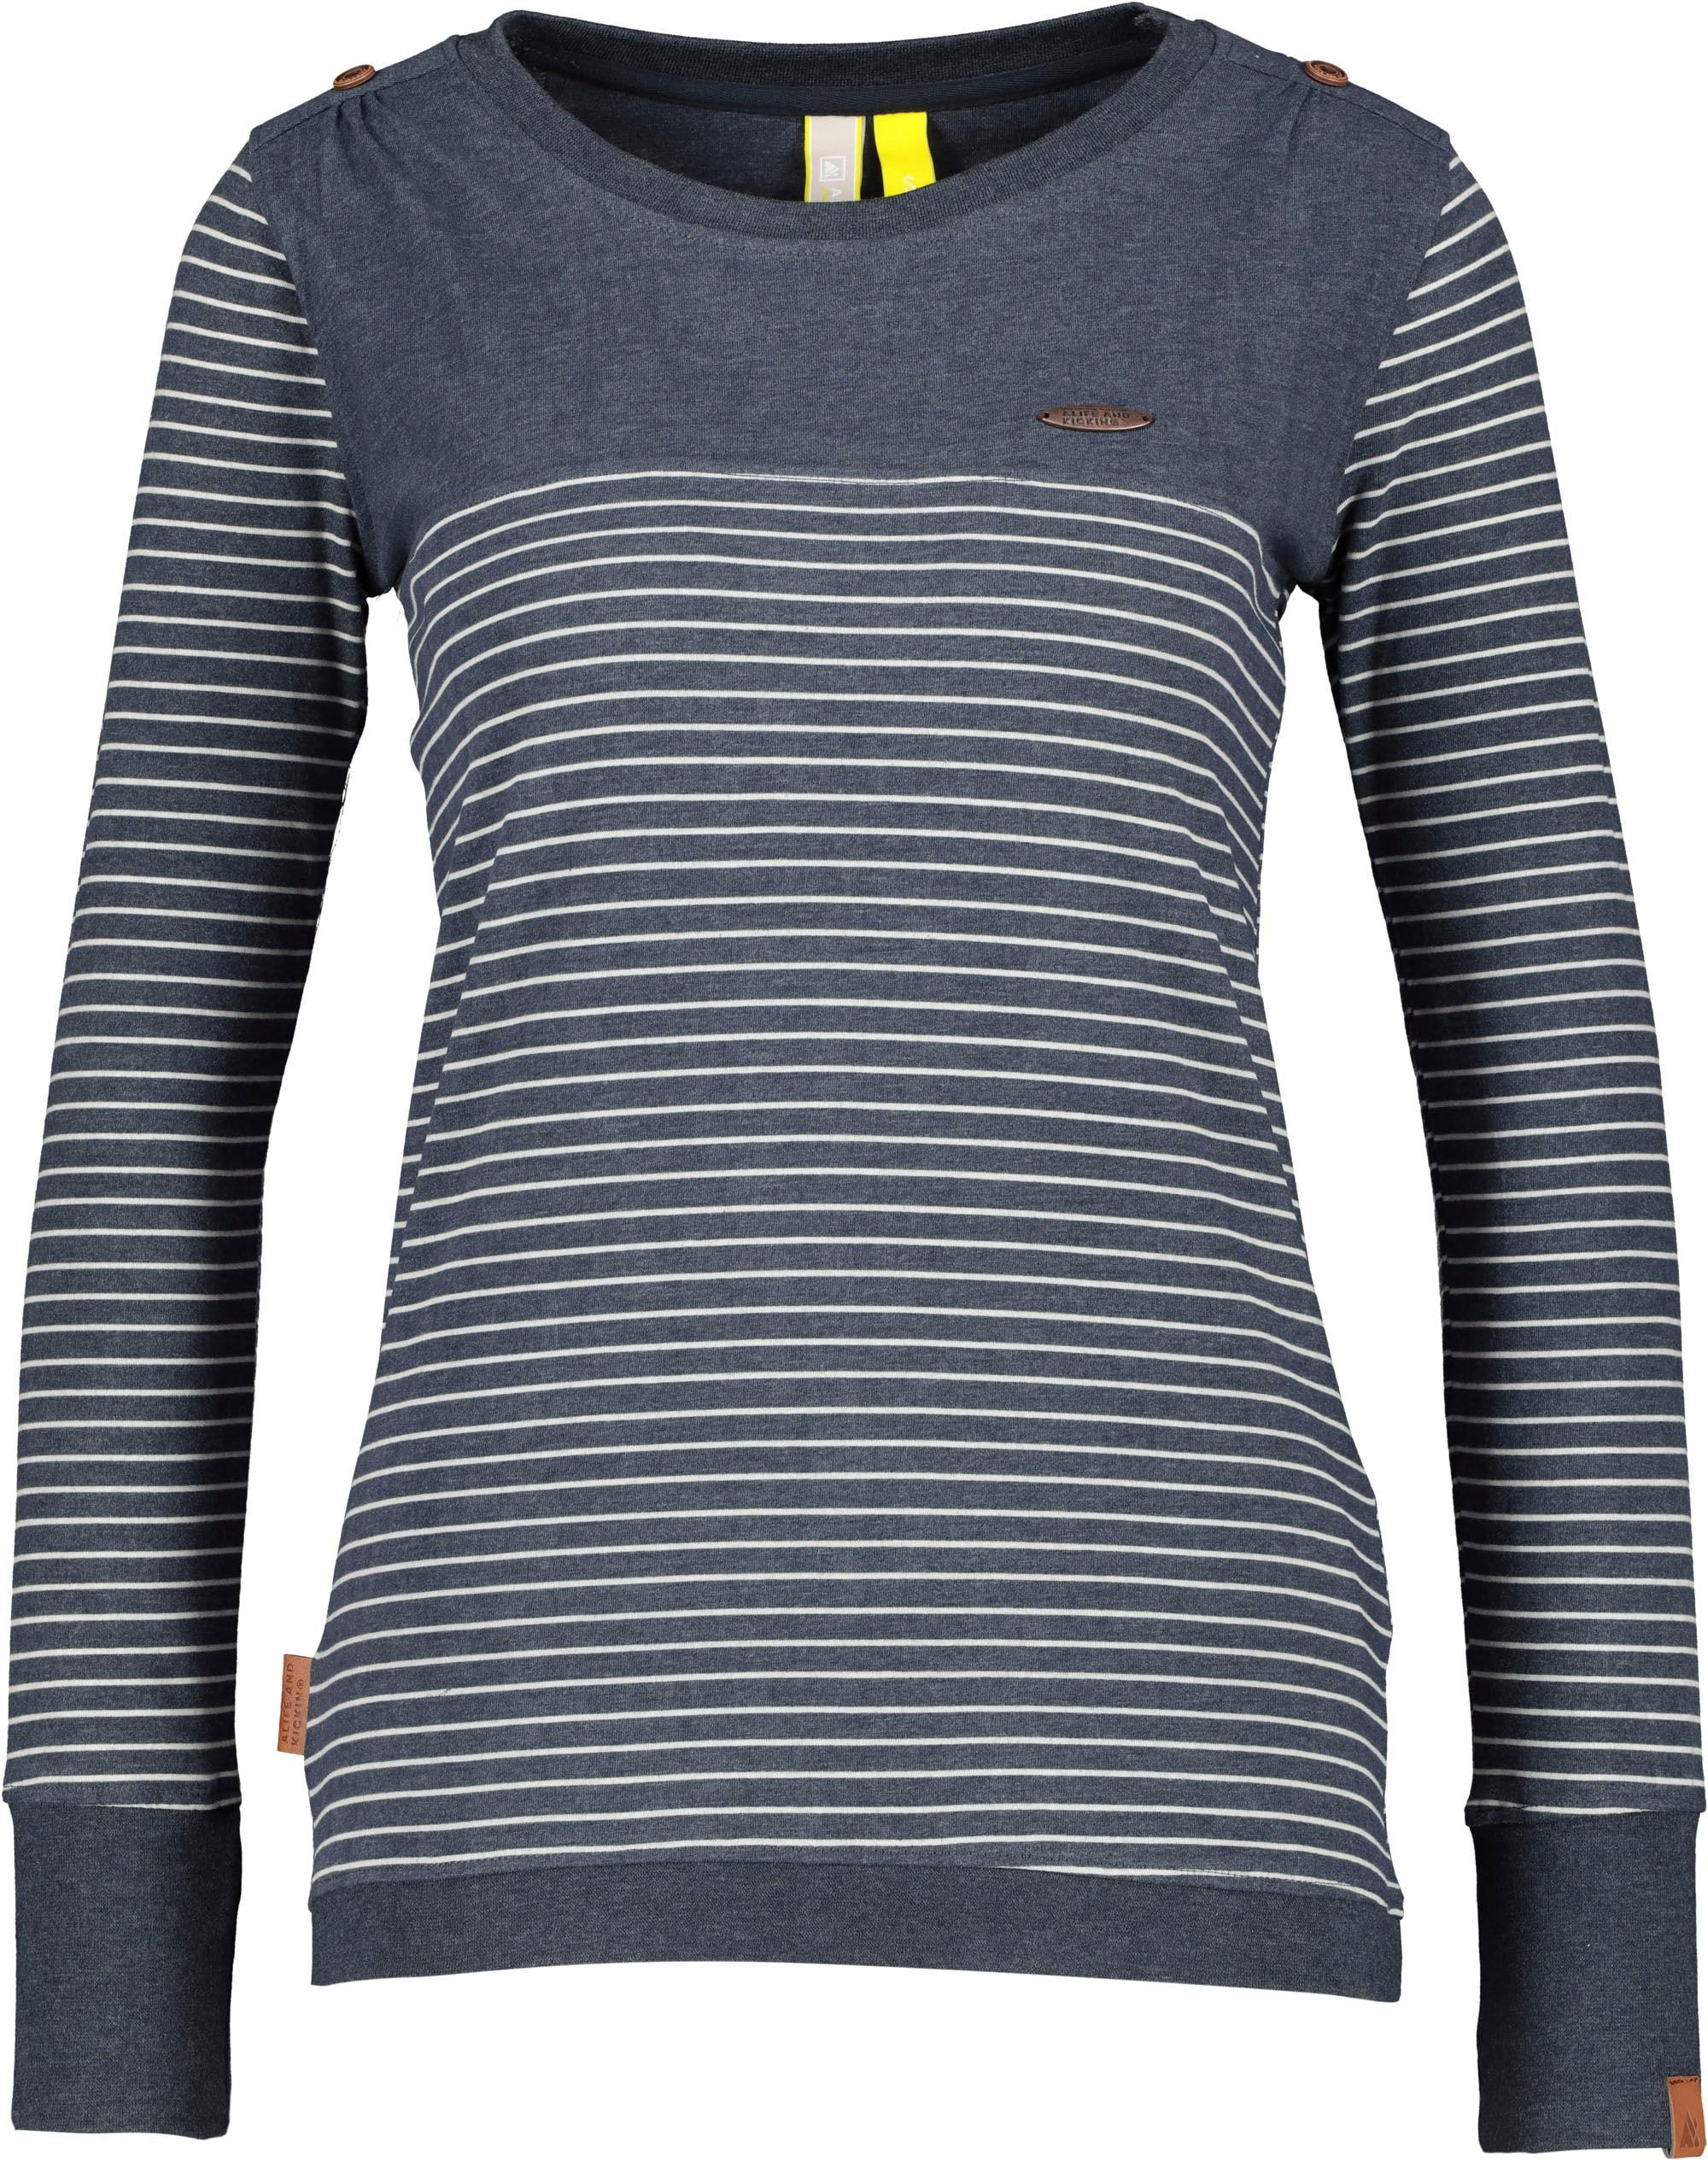 alife & kickin -  T-Shirt LeonieAK, sportives Longsleeve mit zarten Streifen